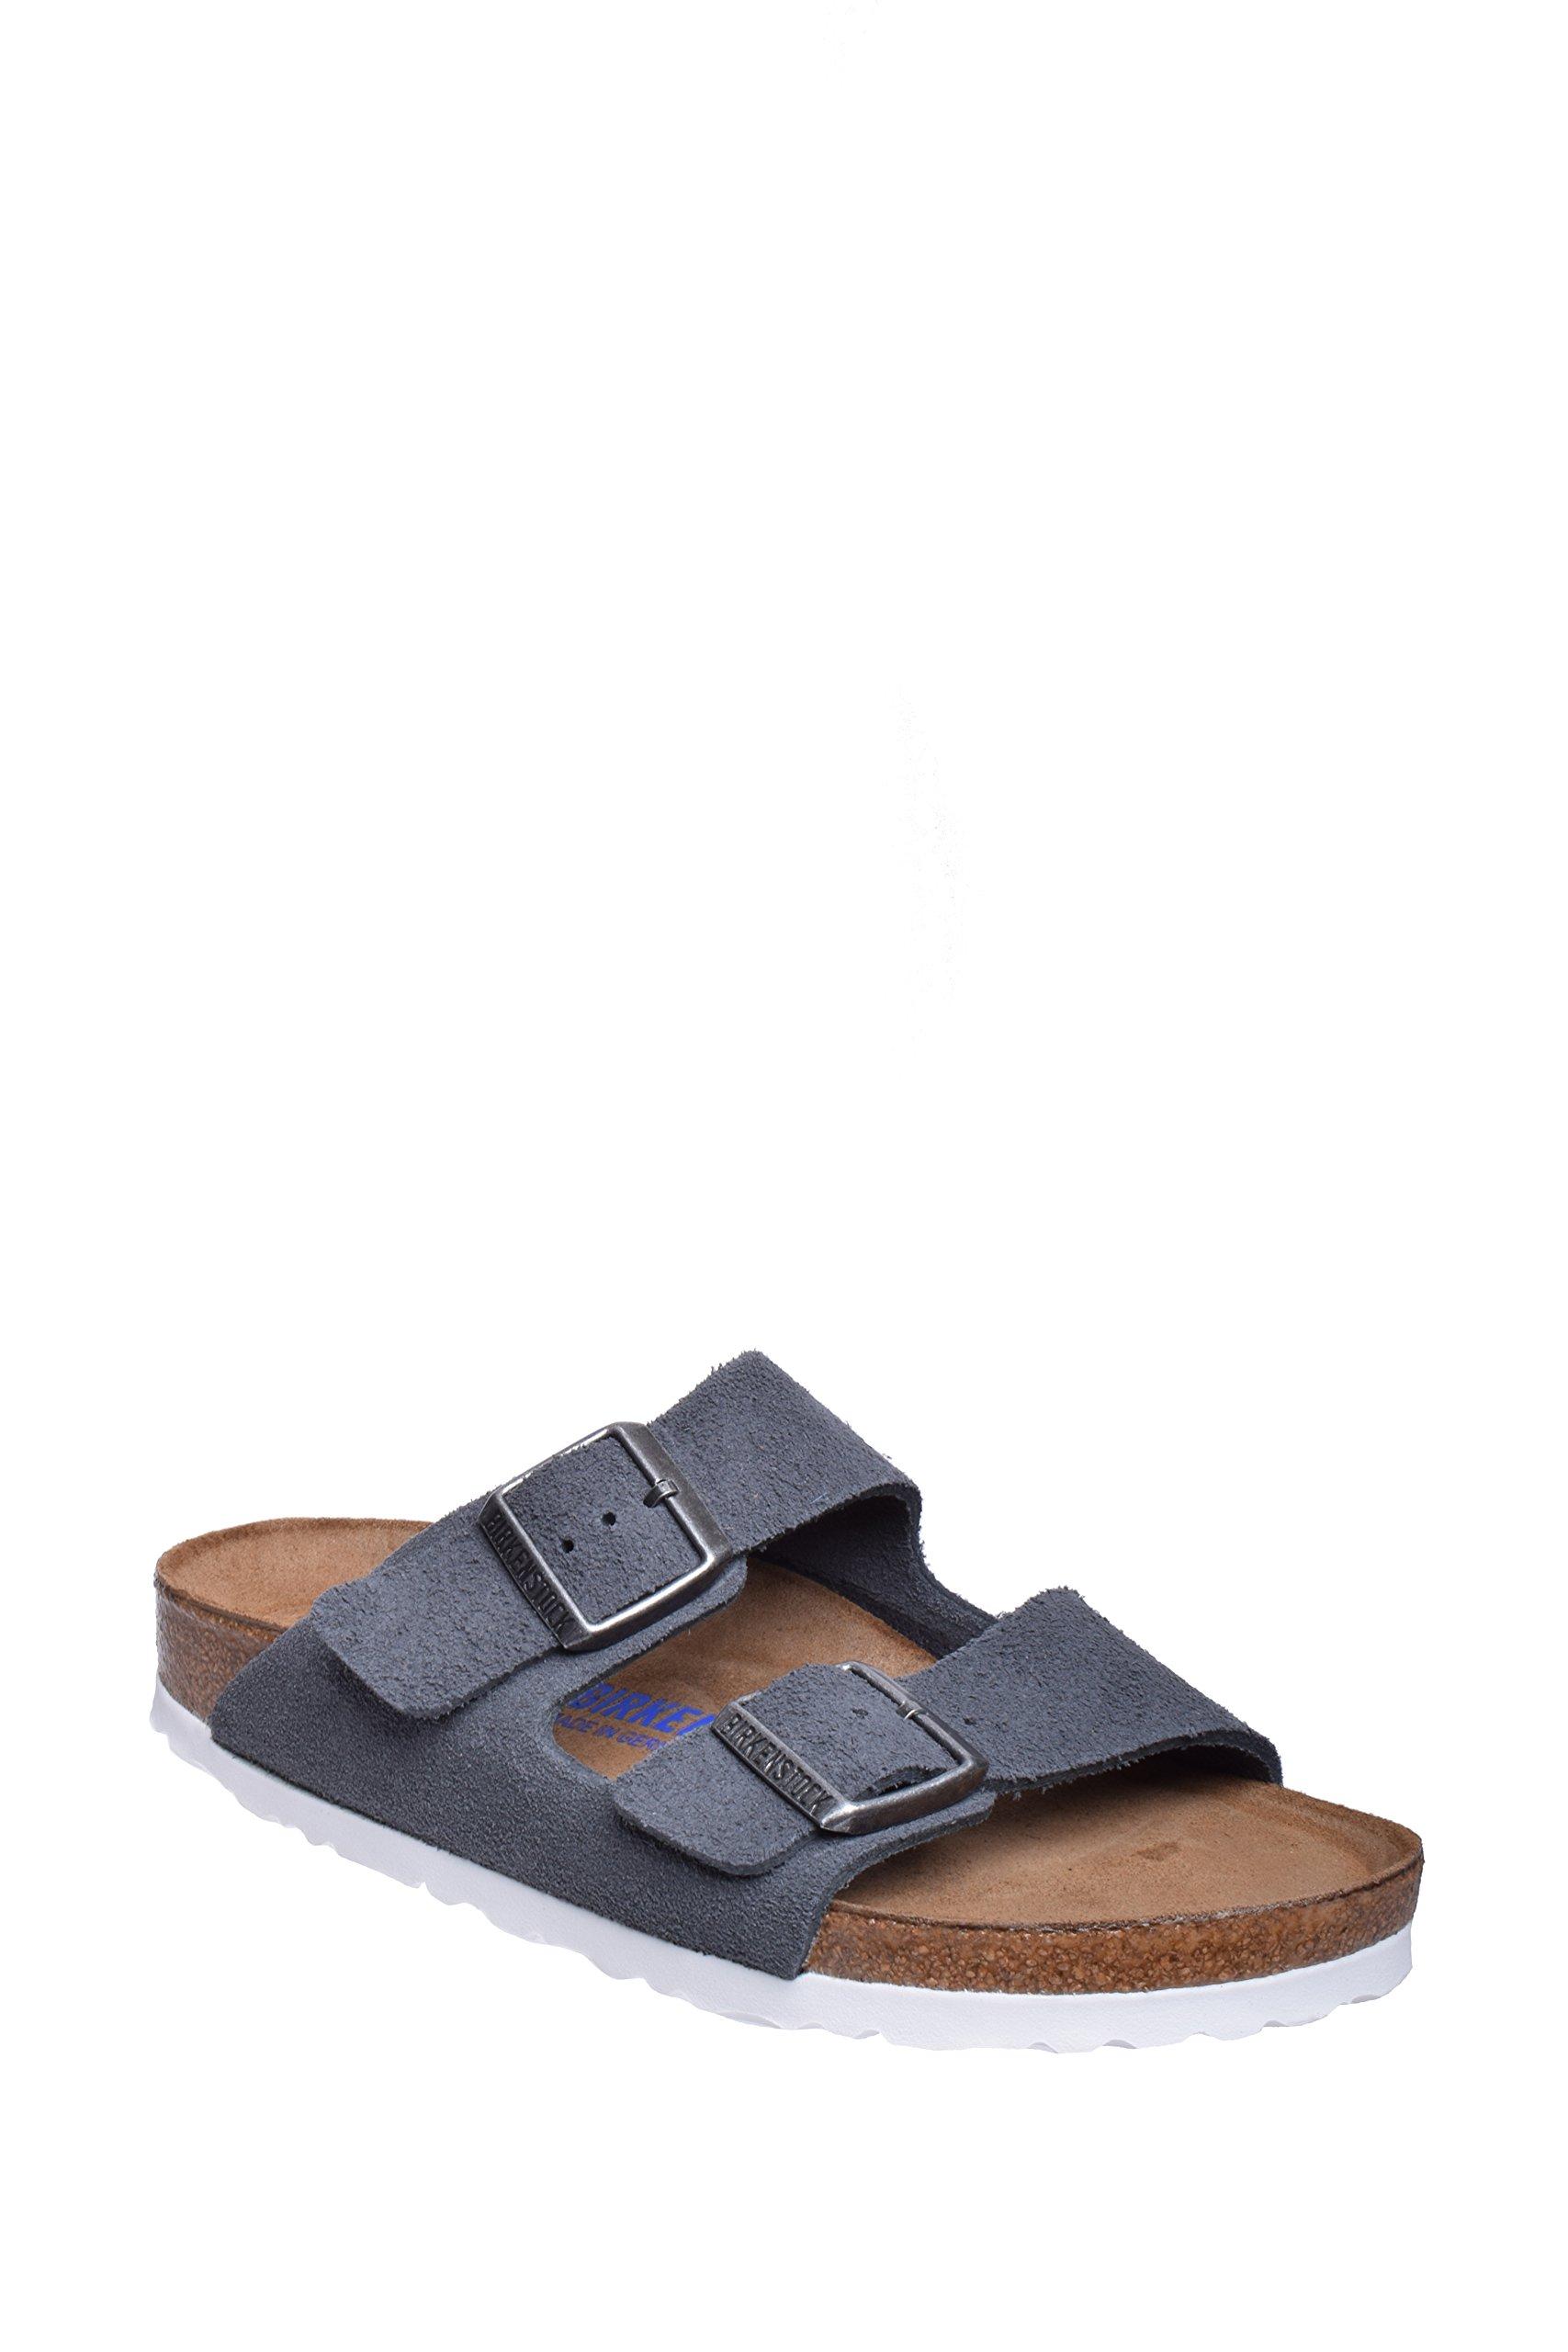 Birkenstock Unisex Arizona Stone Suede Sandals - 10-10.5 2A(N) US Women/8-8.5 2A(N) US Men